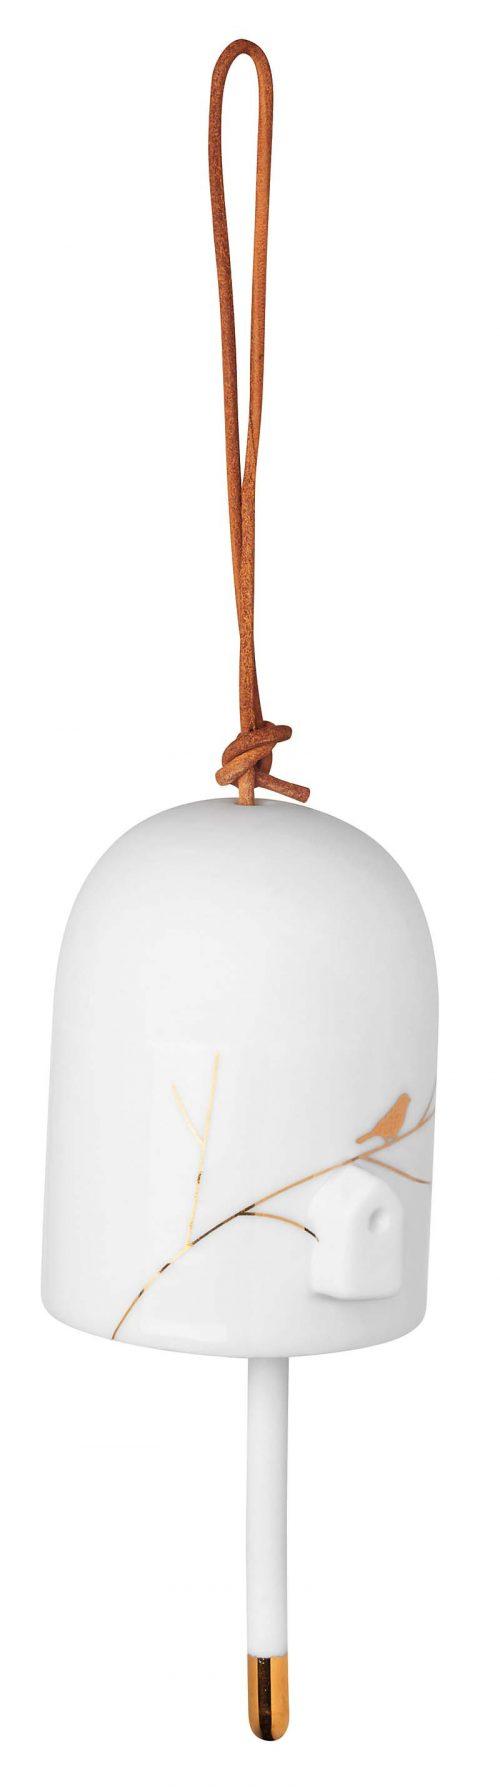 porcelain bell birdhouse jail dornoch